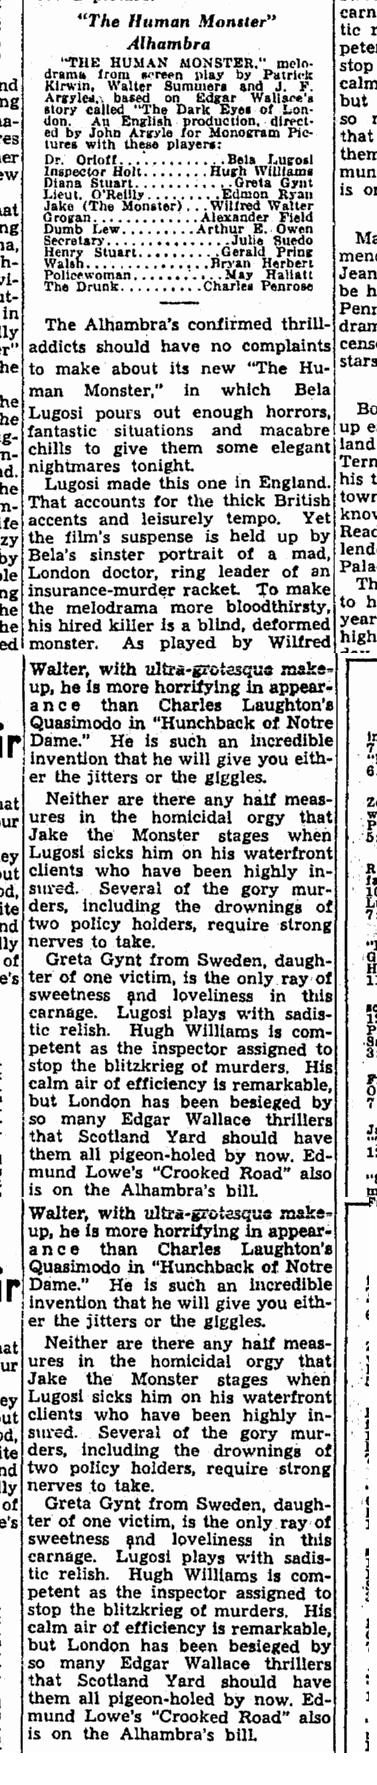 Human Monster, Cleveland Plain Dealer, June 14, 1940